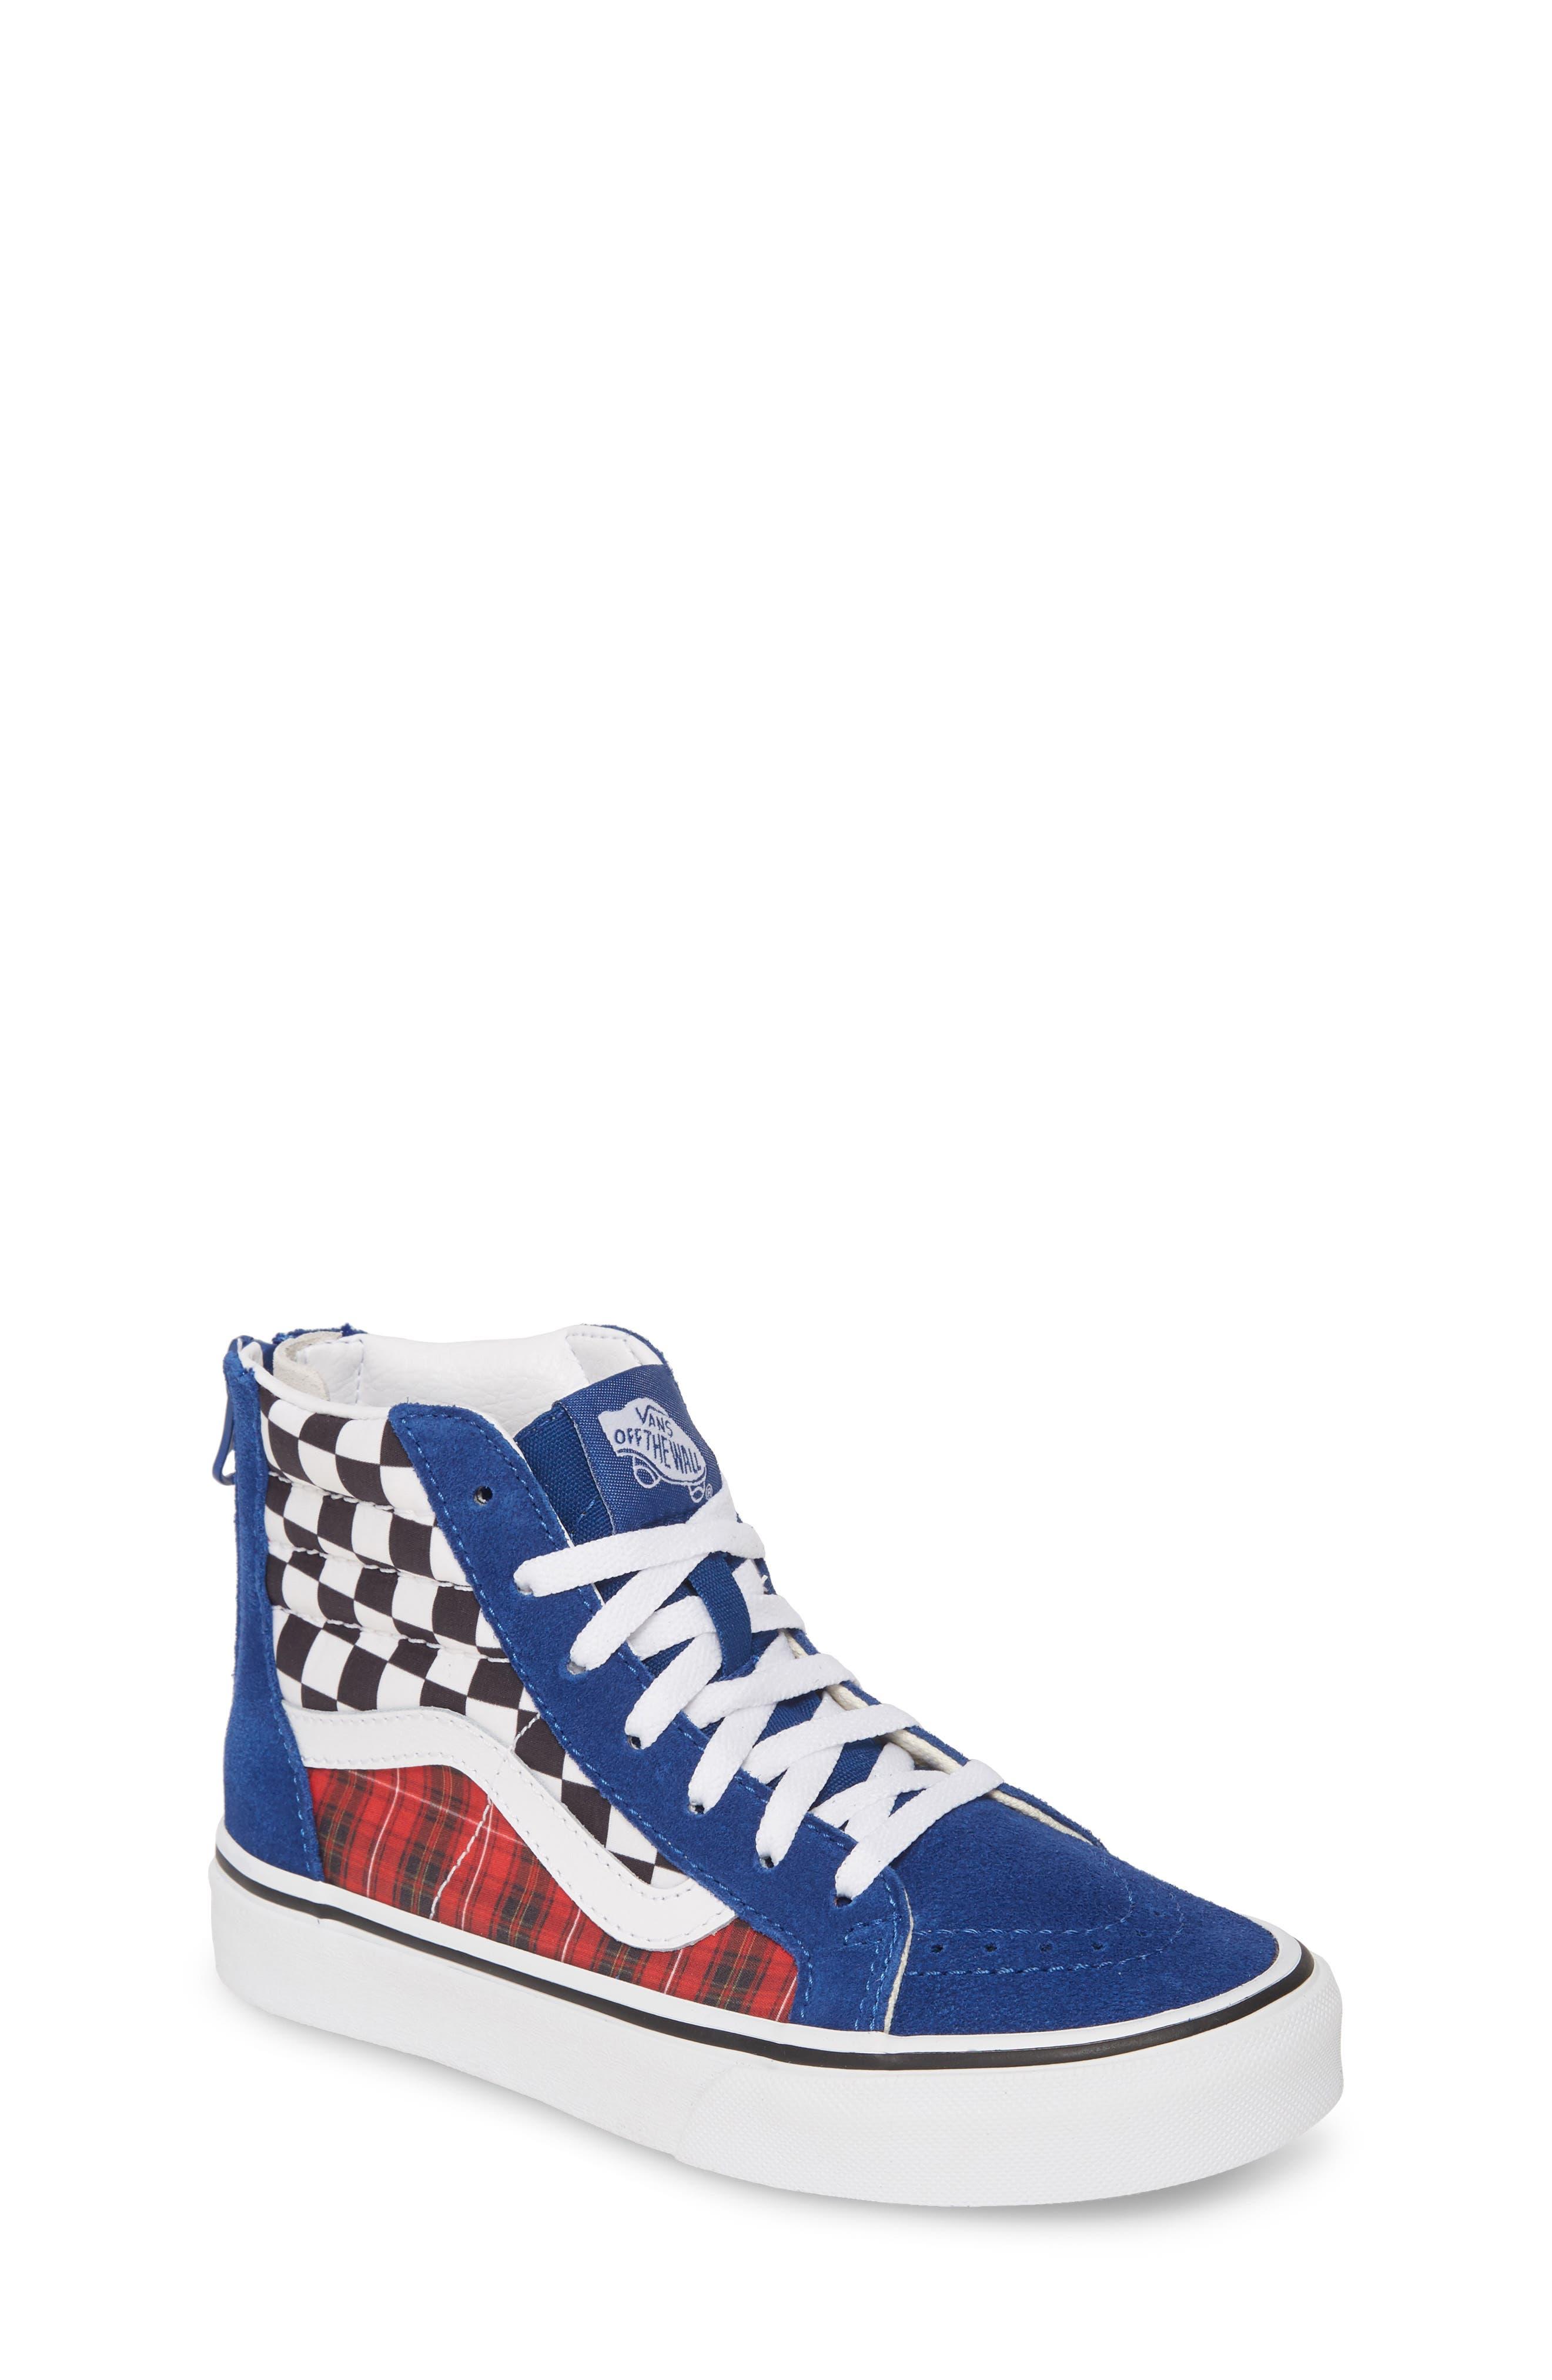 MARVEL AUTHENTIC Sneaker low multicolor